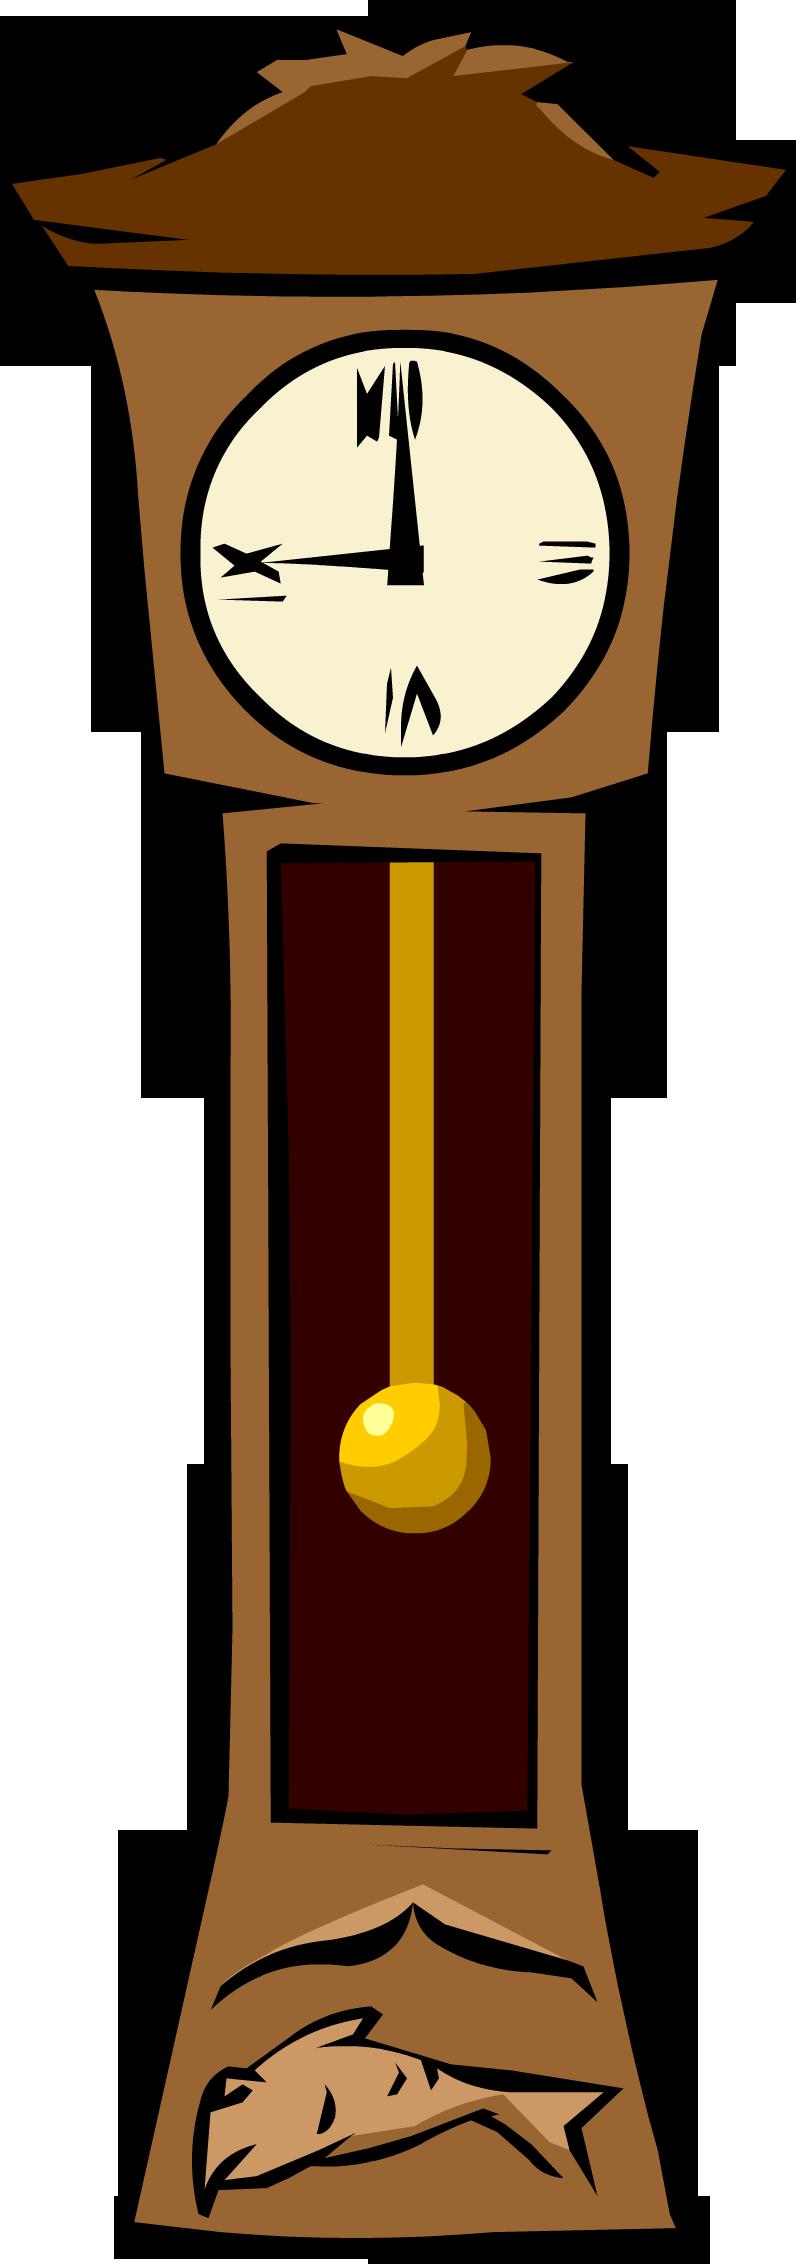 796x2264 Grandfather Clock Clipart Free Download Clip Art